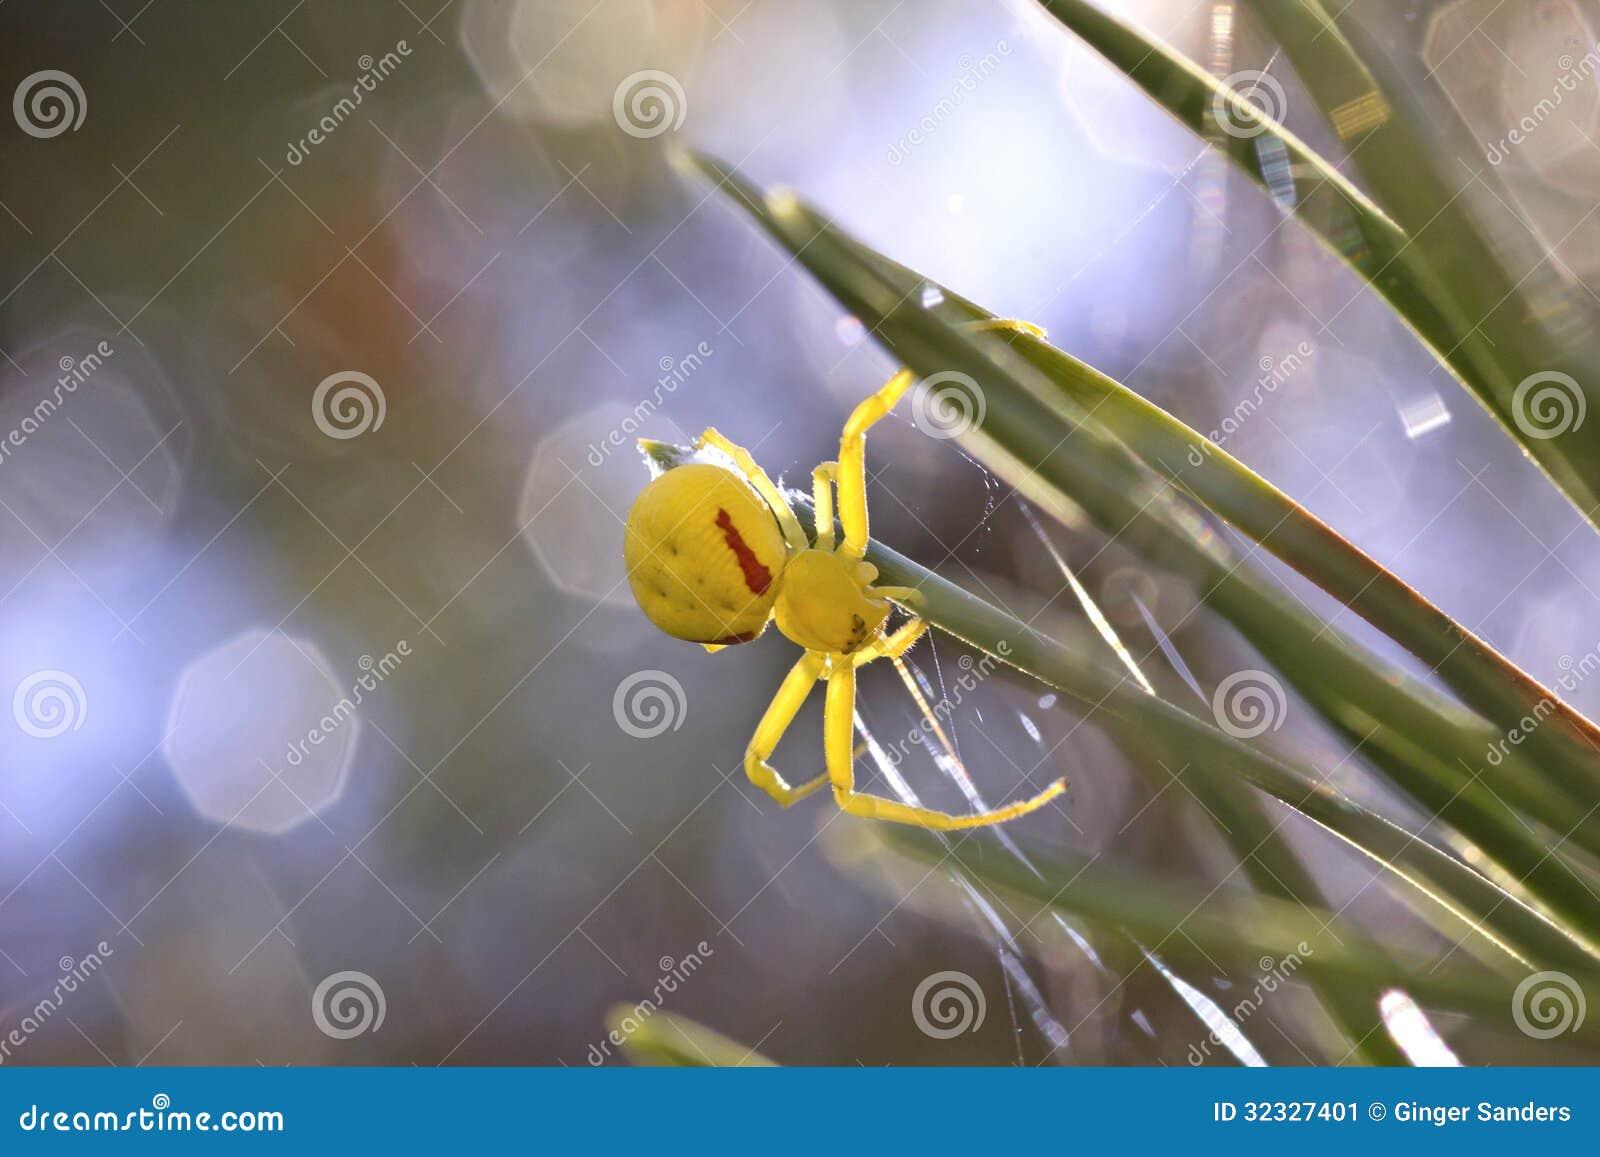 Female Goldenrod Crab Spider Stock Image - Image: 32327401